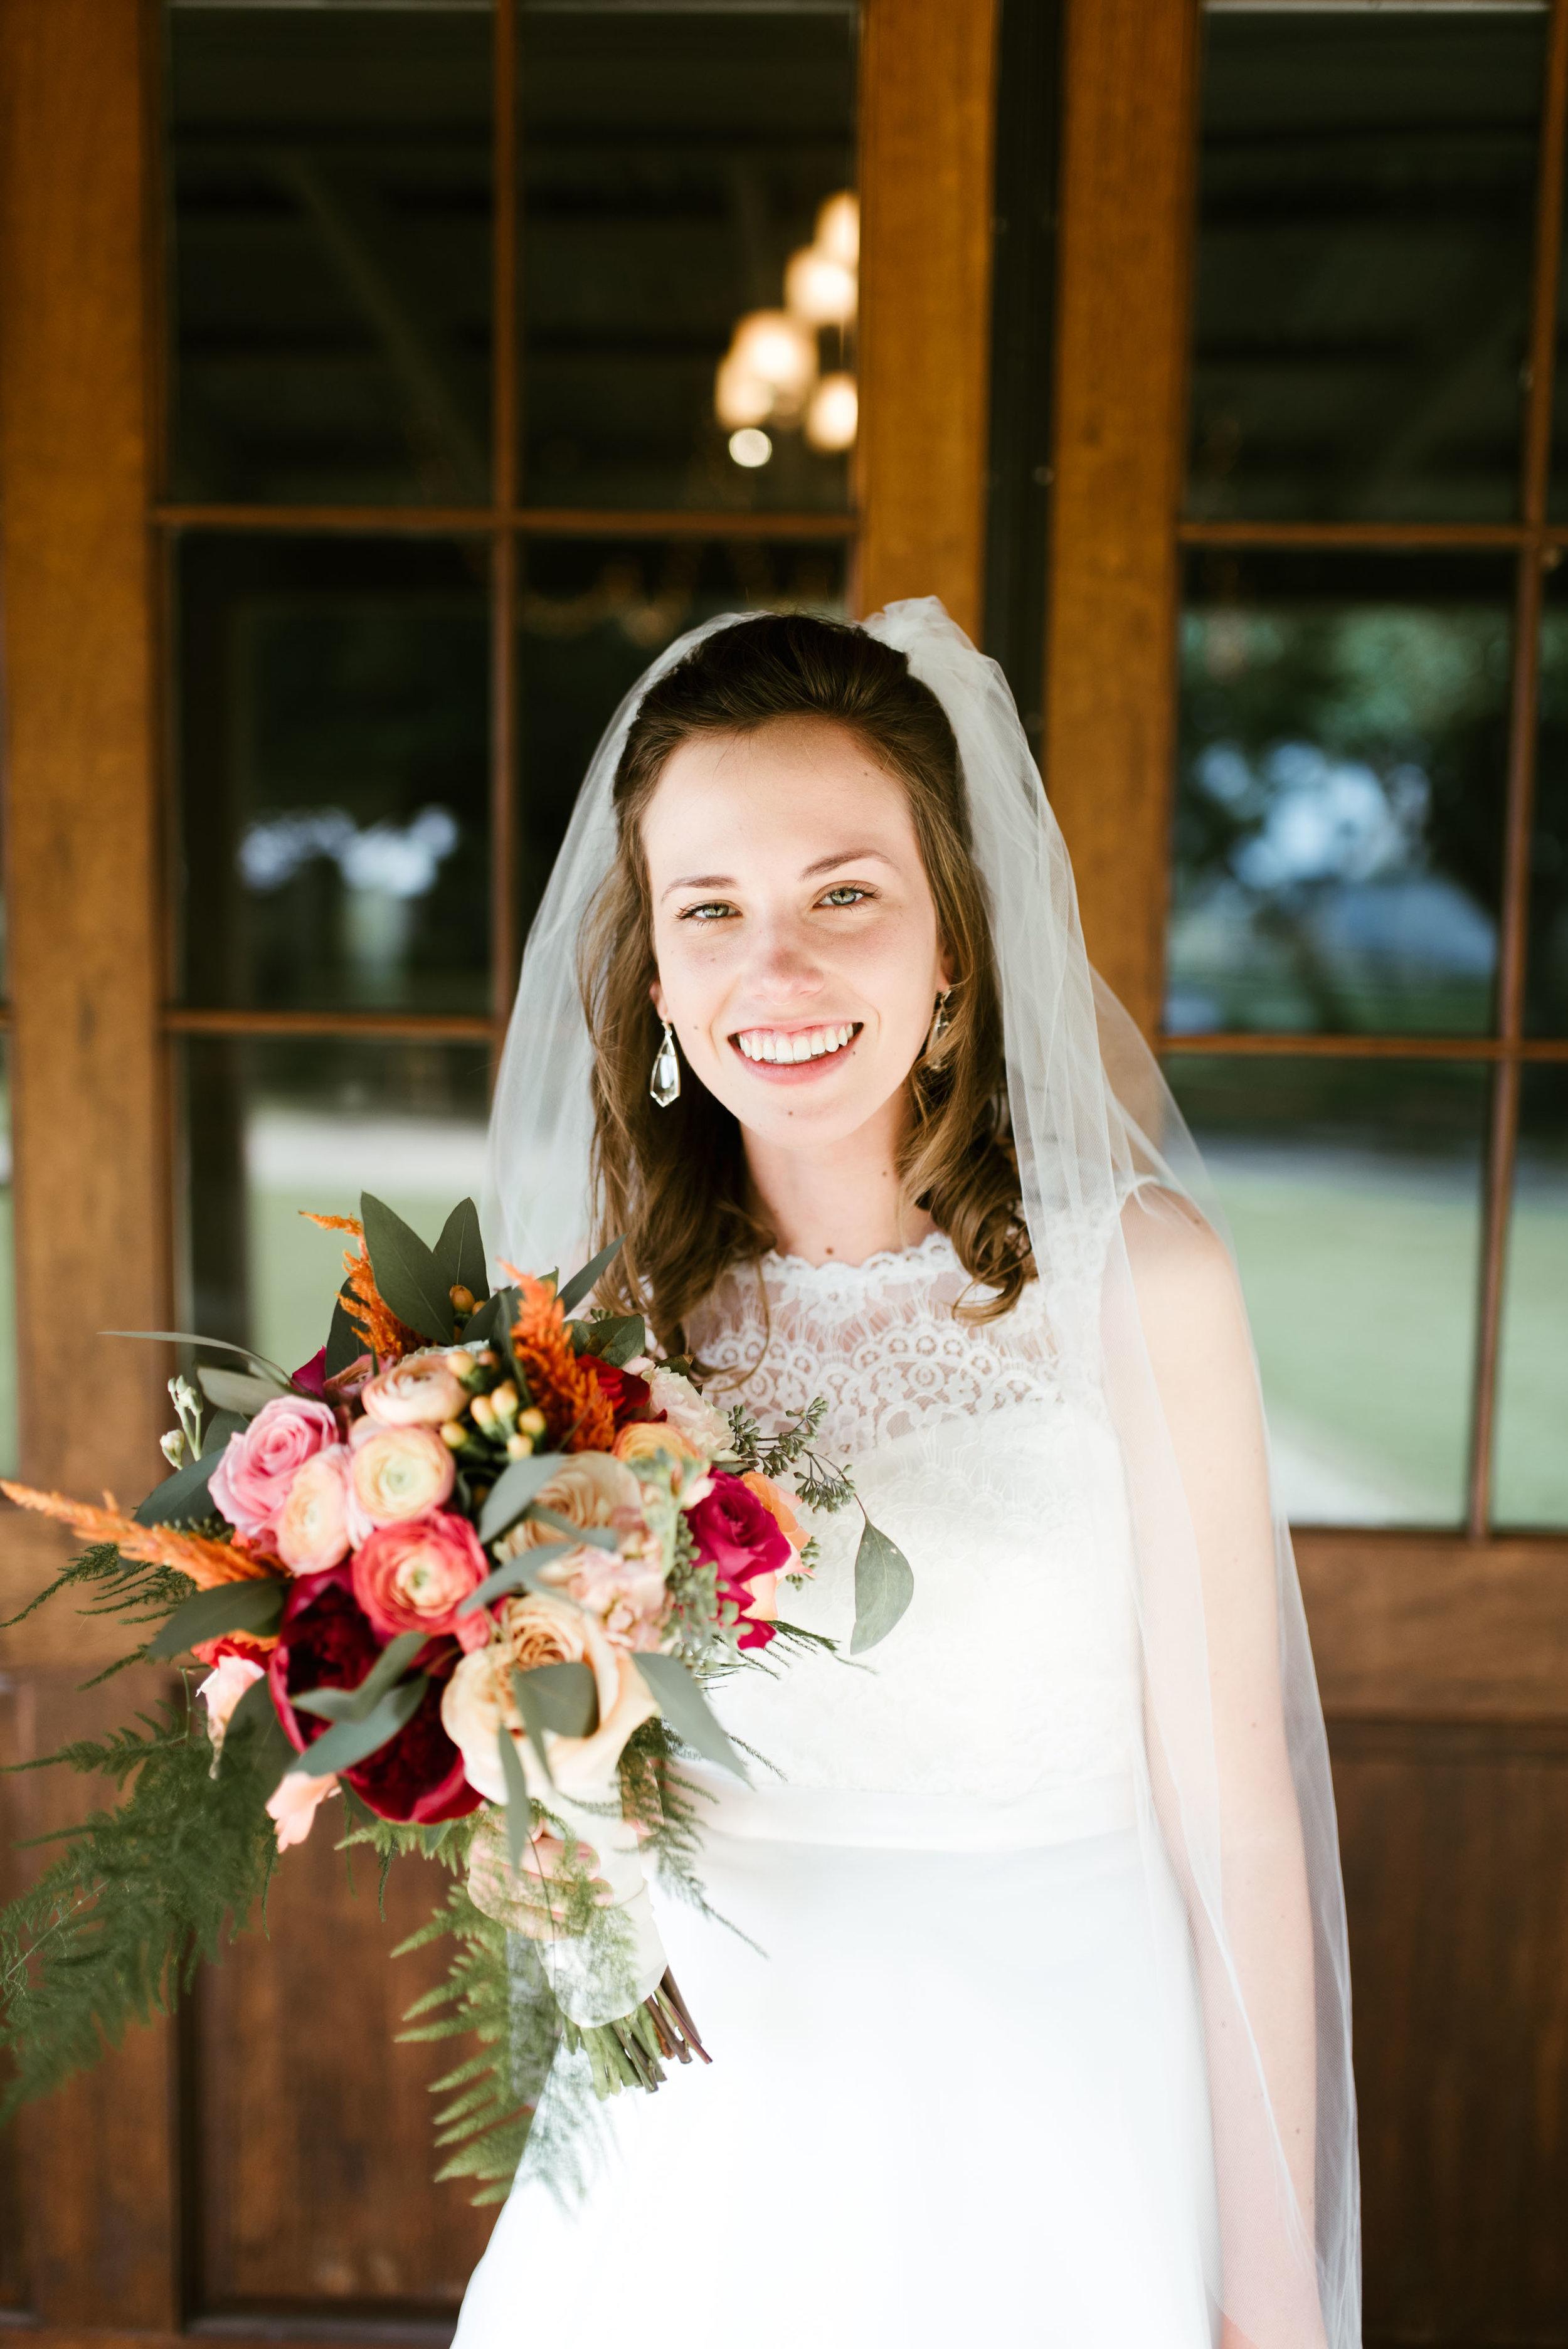 Henkel Hall Wedding, Round Top   Houston Natural Light Wedding Photographer   www.jordanmitchellphotography.com